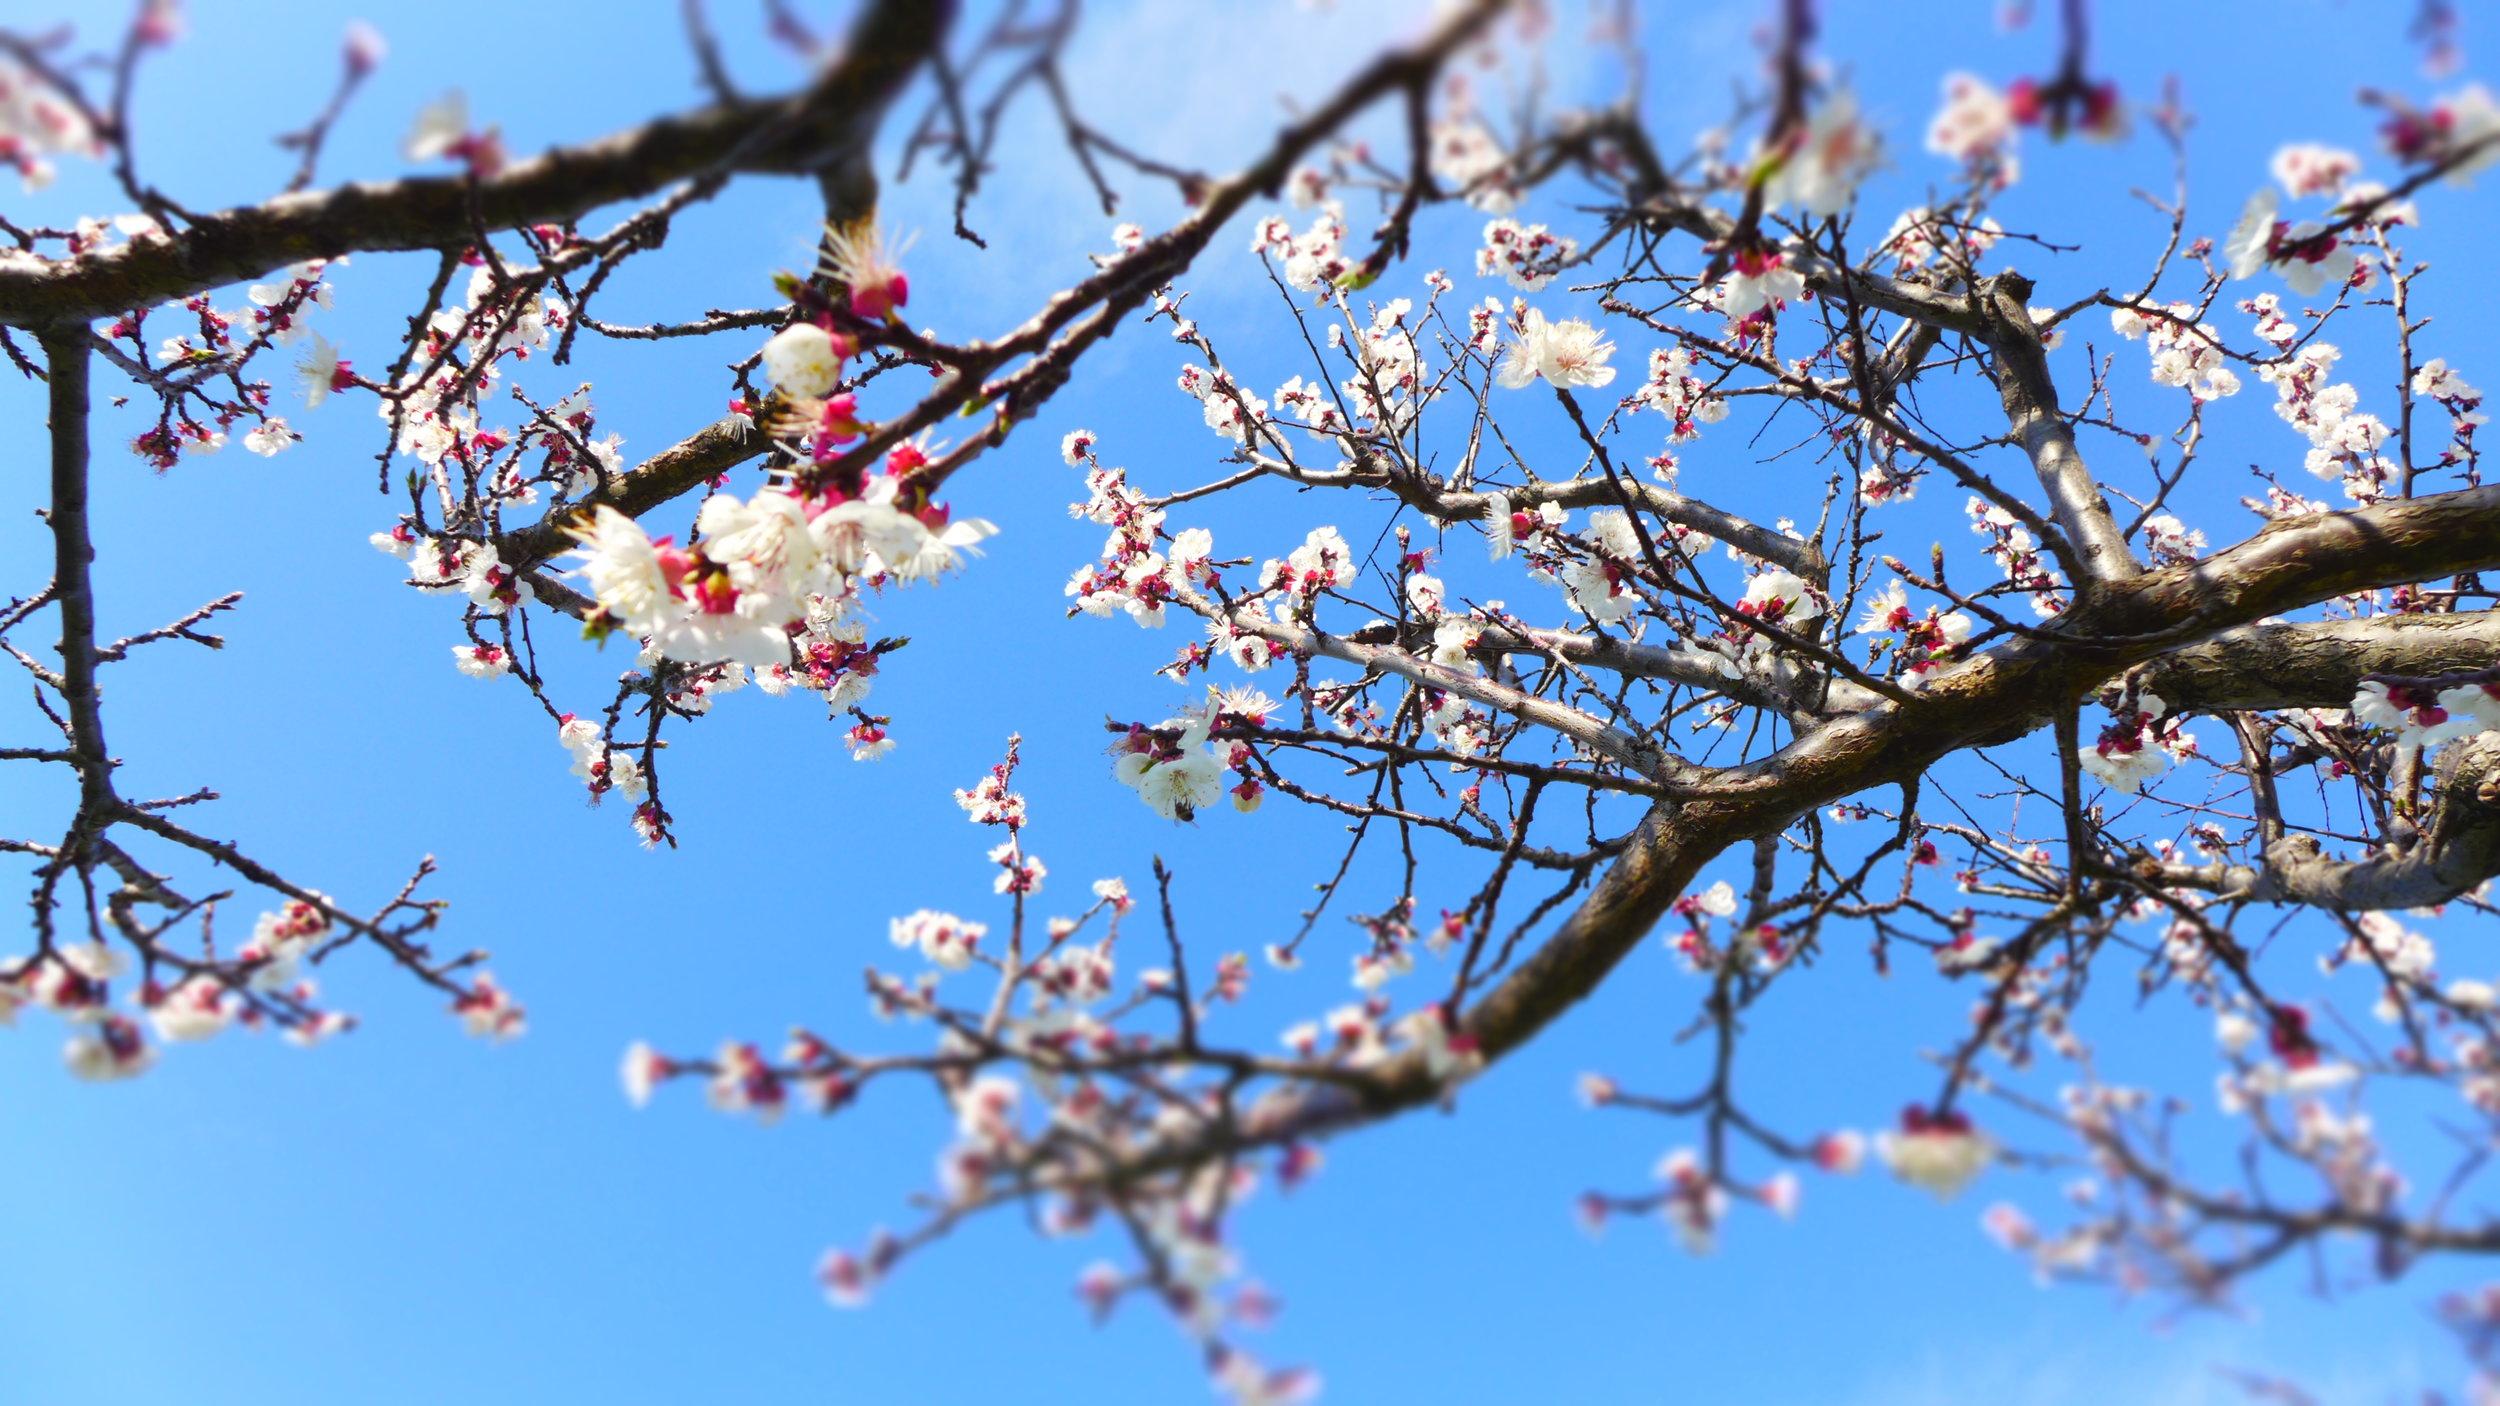 spring 1 - possible header photo.JPG